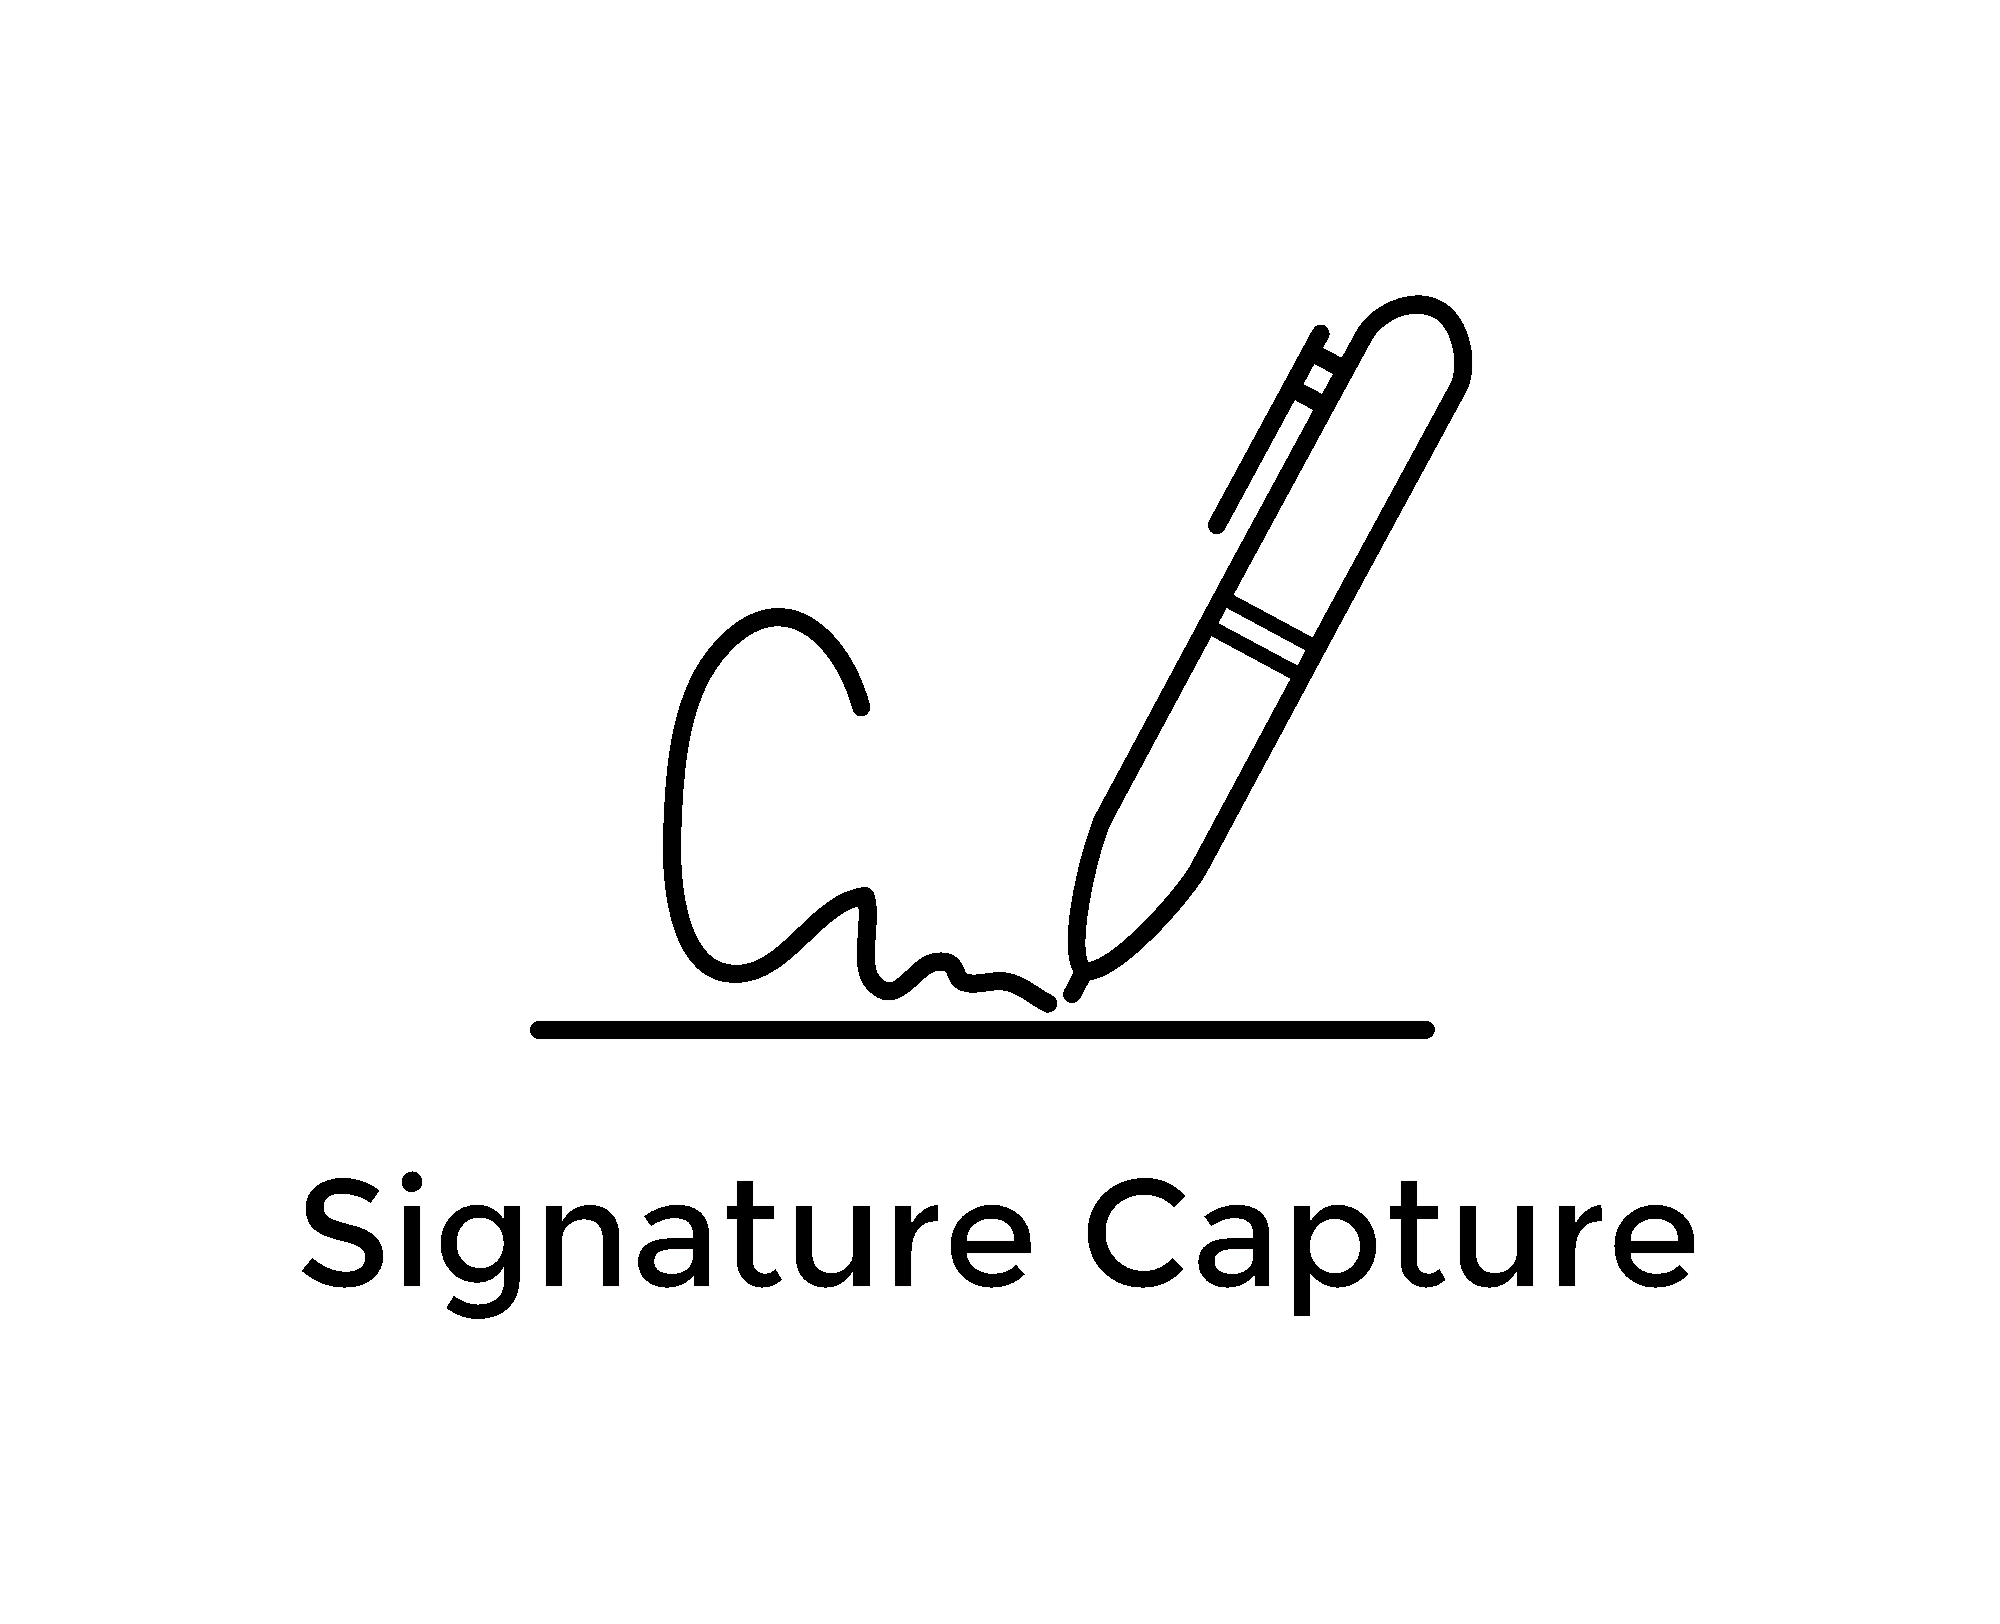 Signature Capture-logo Black.png